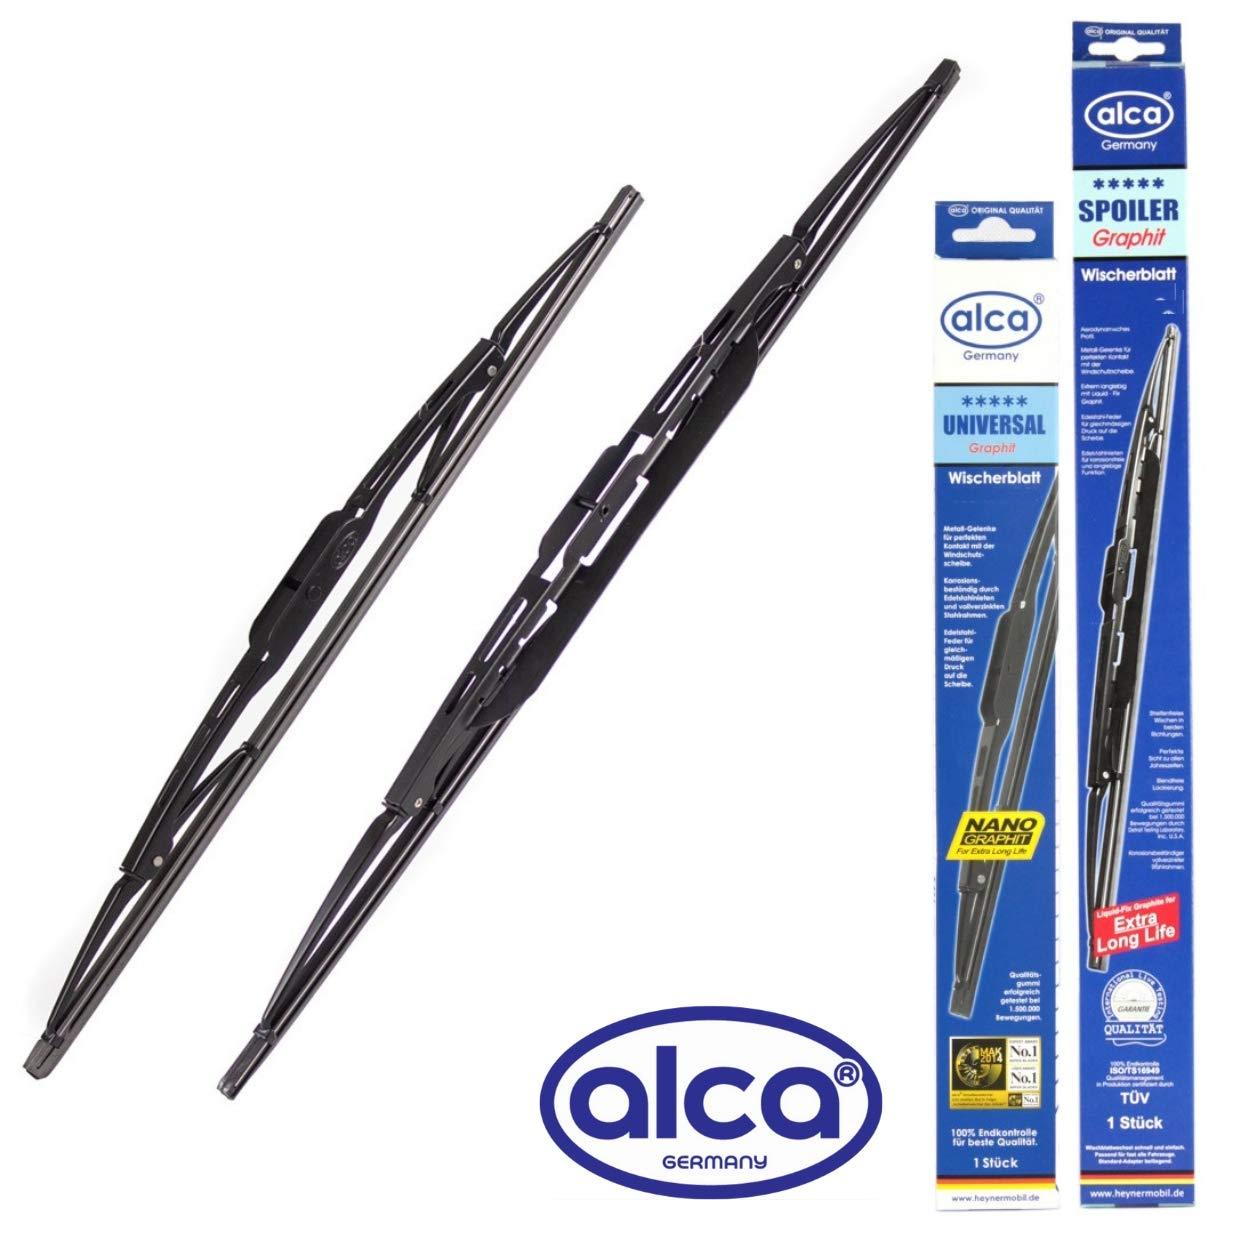 Alca Spoiler Windscreen Wiper Blades Front Replacement Set 2418 AUS2418H CX-5 2012-2016